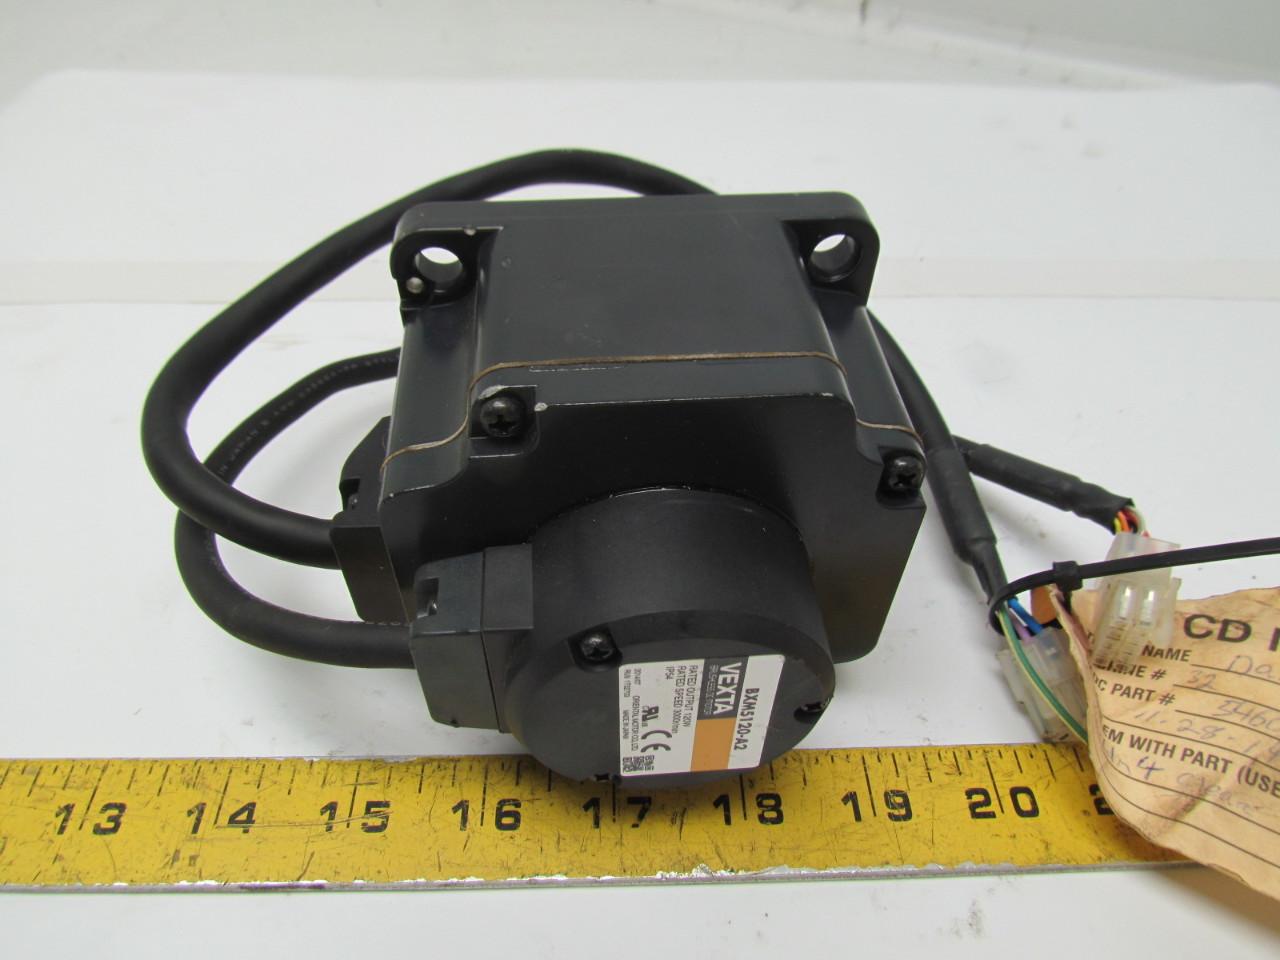 Oriental Motor Vexta Bxm5120 A2 Brushless Dc Motor 120w